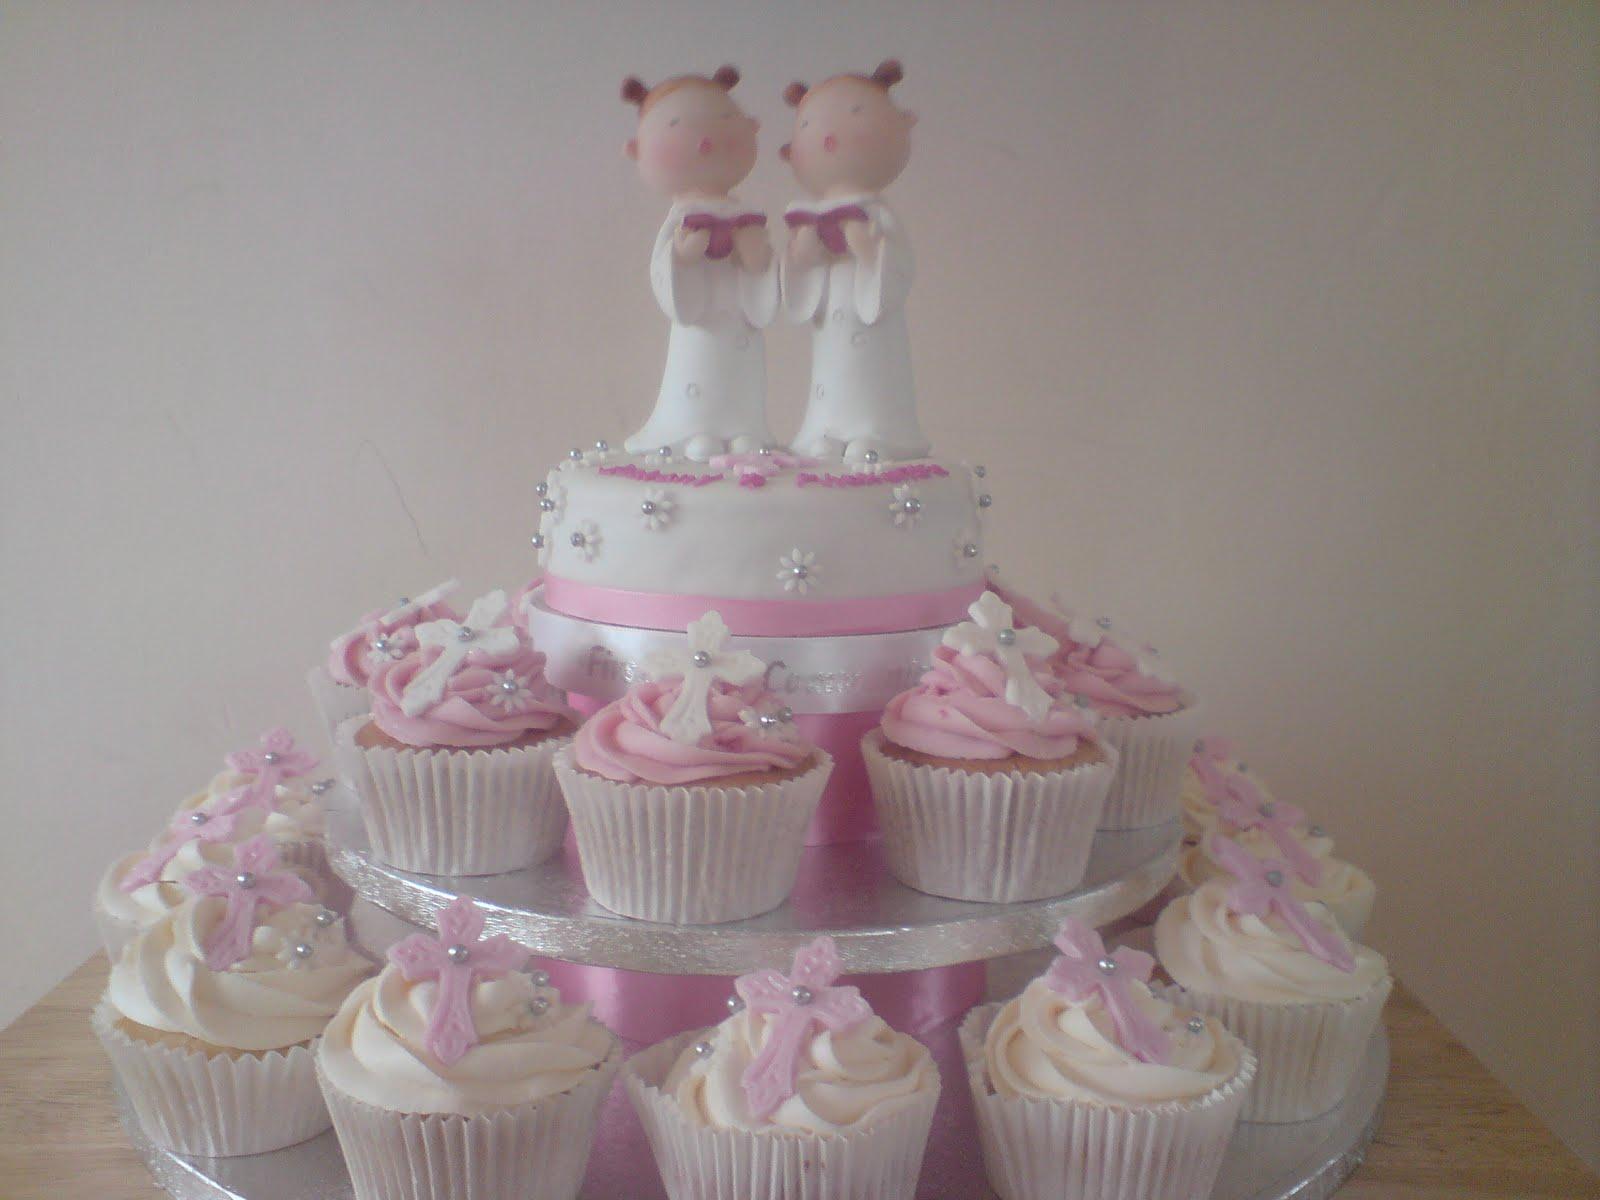 Cupcake Decorations Asda : Asda Cupcake Cake Ideas and Designs